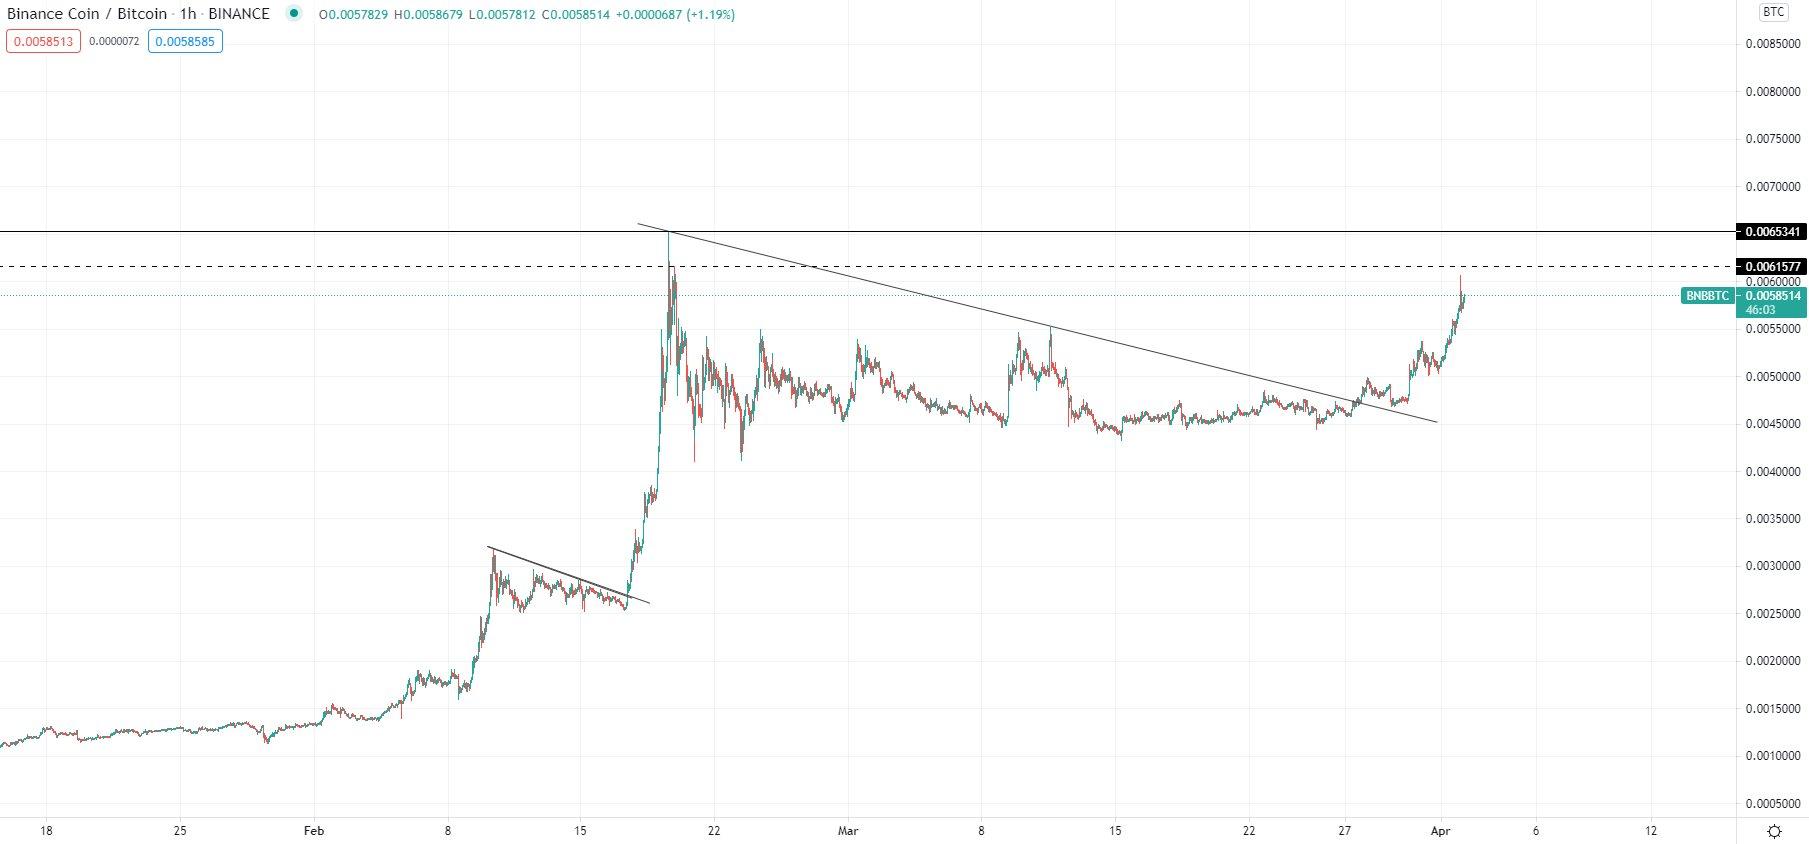 Kaleo analisa o mercado da BNB. Fonte: Kaleo/Twitter